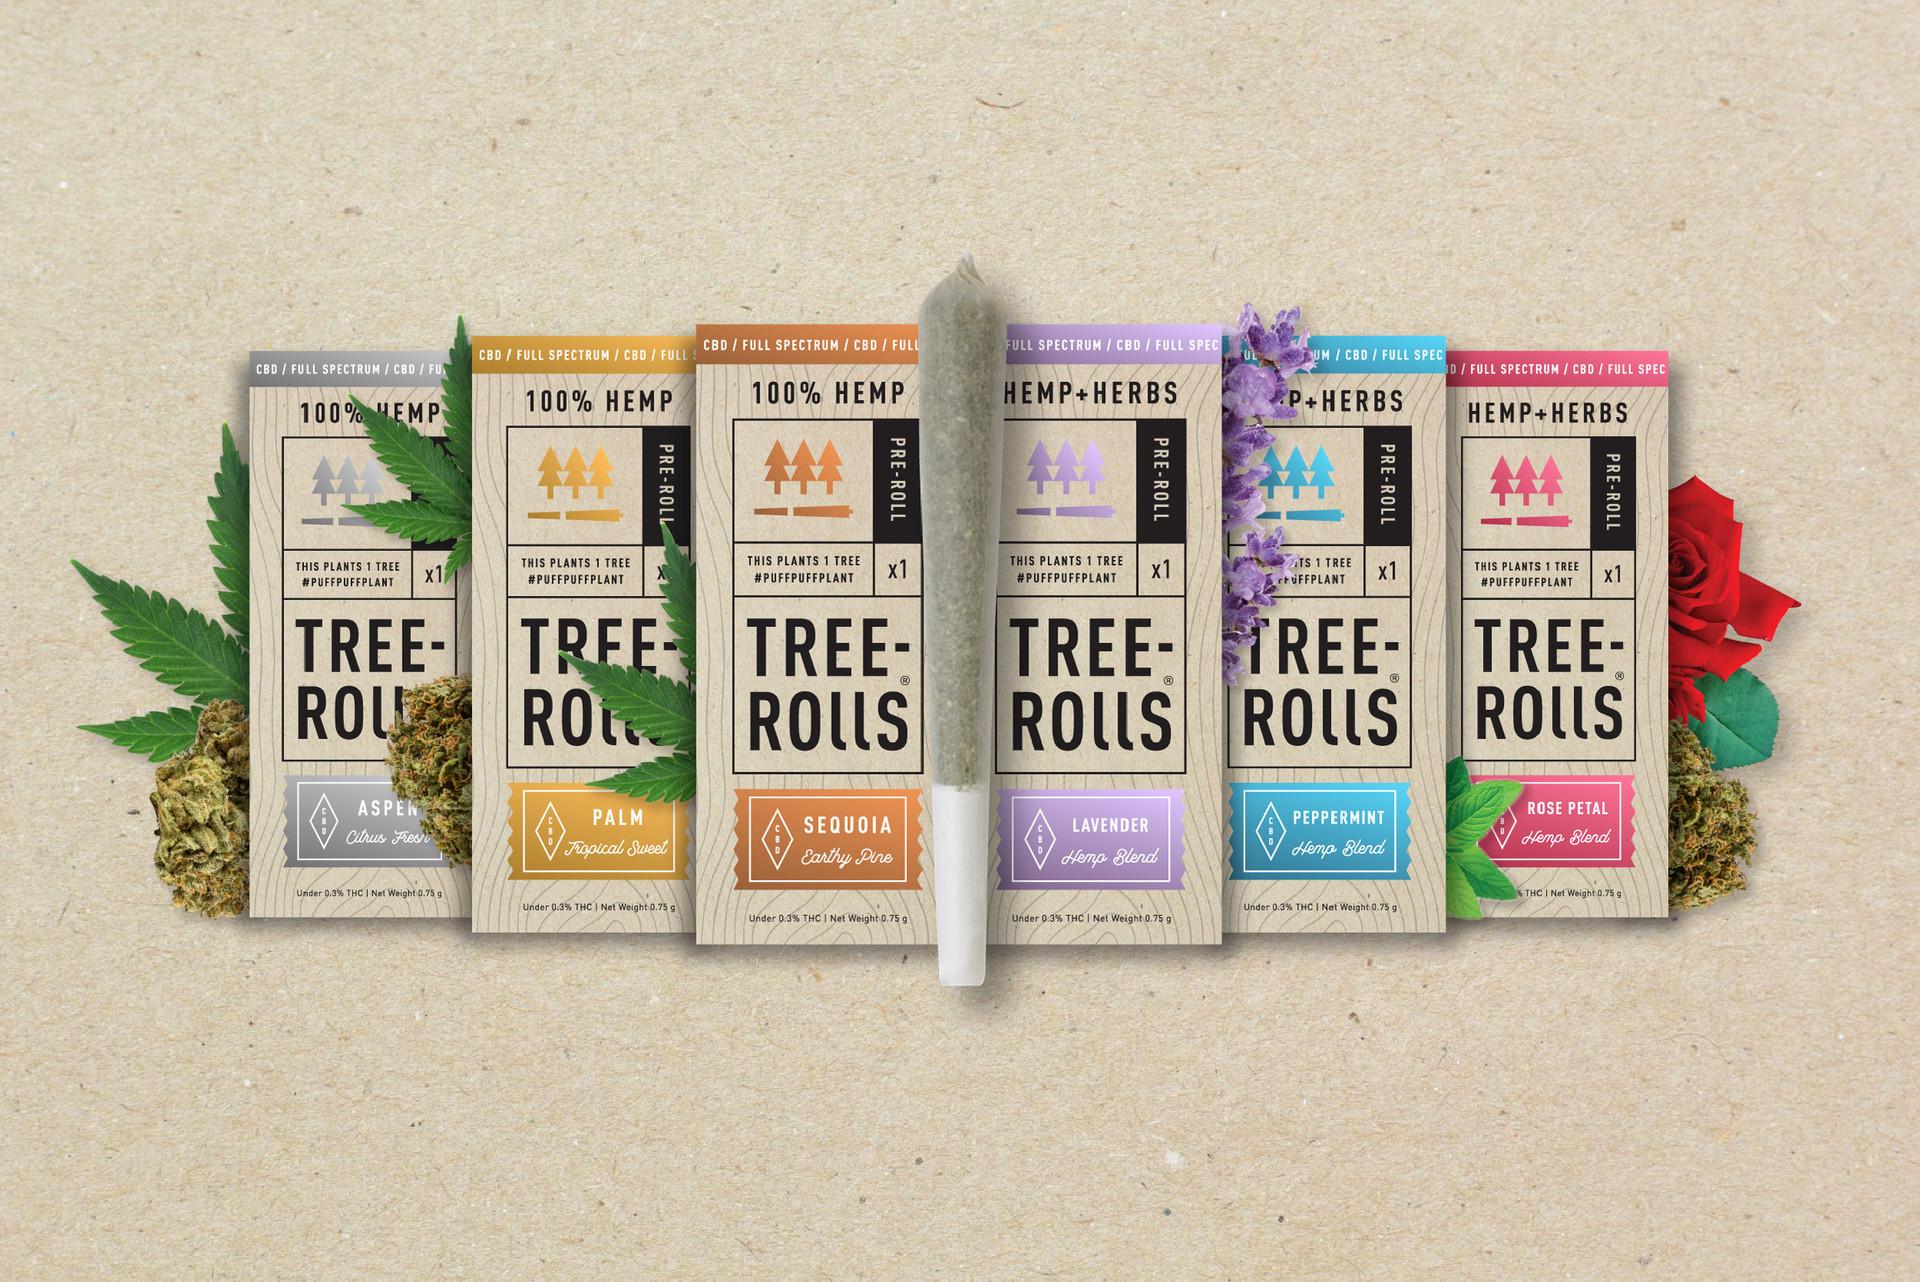 Tree-Rolls_CBD_CBG_pre-rolls_cannabis_pa